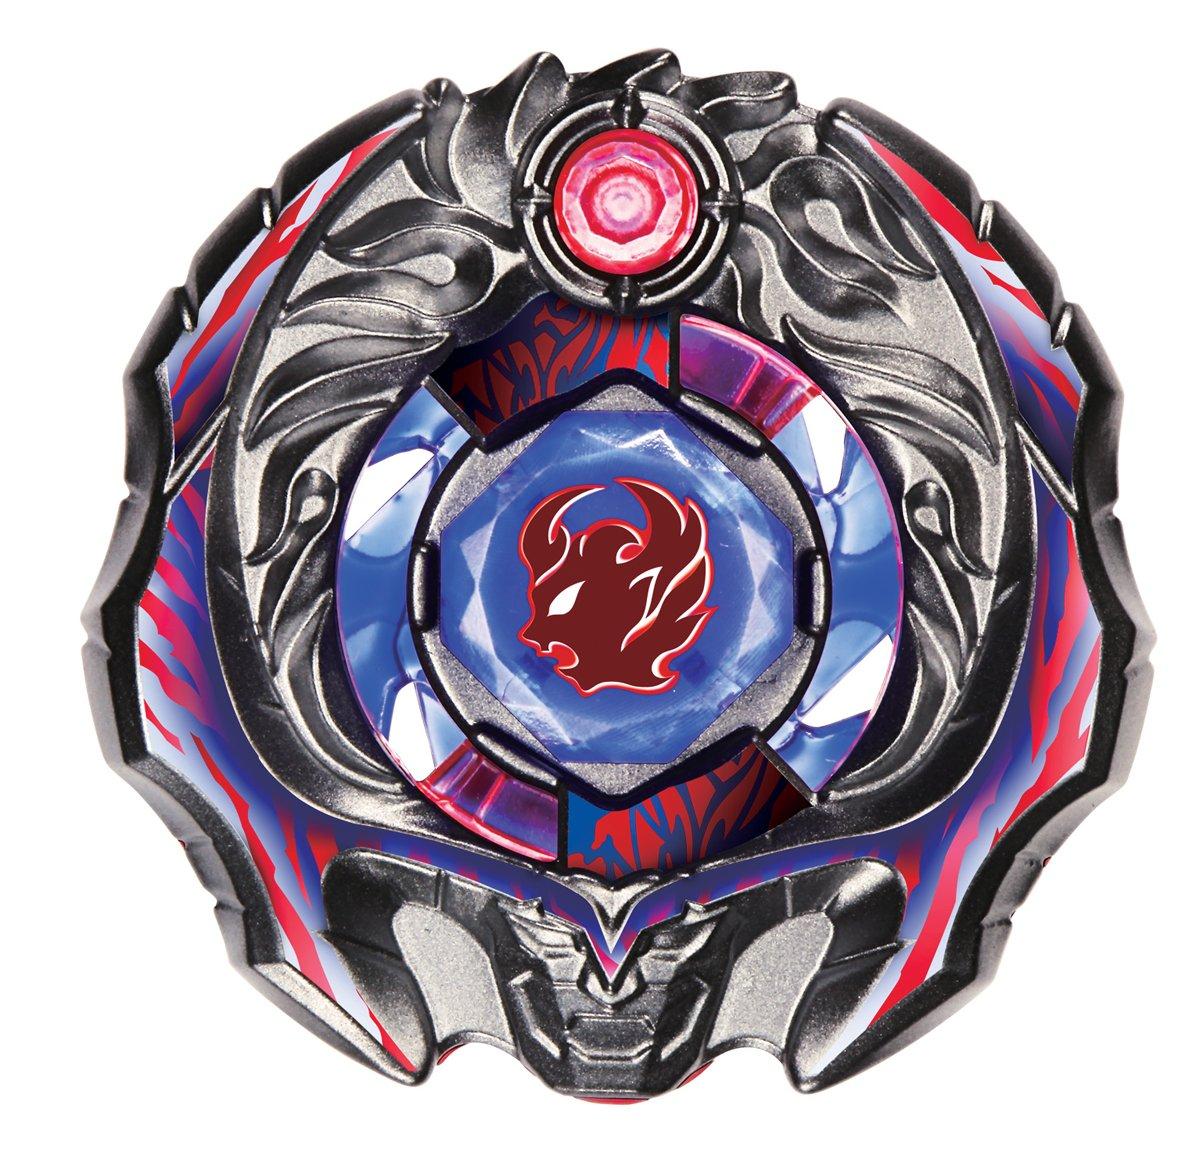 Beyblades #BBG-01 Japanese Shogun Steel Zero G Battle Top Starter Samurai Ifraid W145CF Japan VideoGames BB-452973